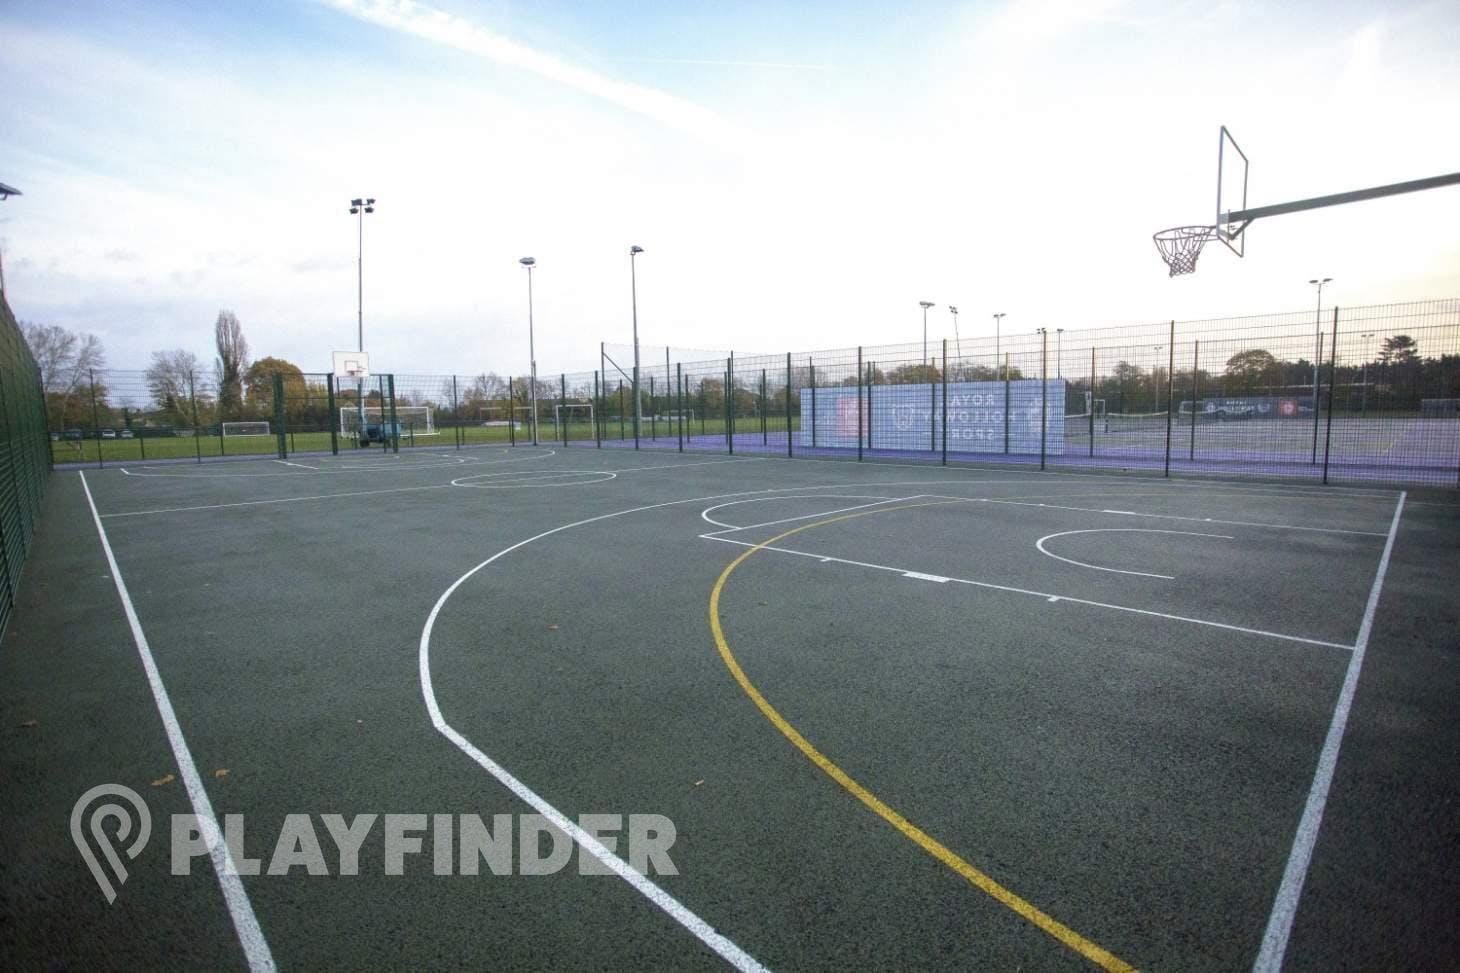 Royal Holloway University Sports Centre Outdoor | Hard (macadam) basketball court